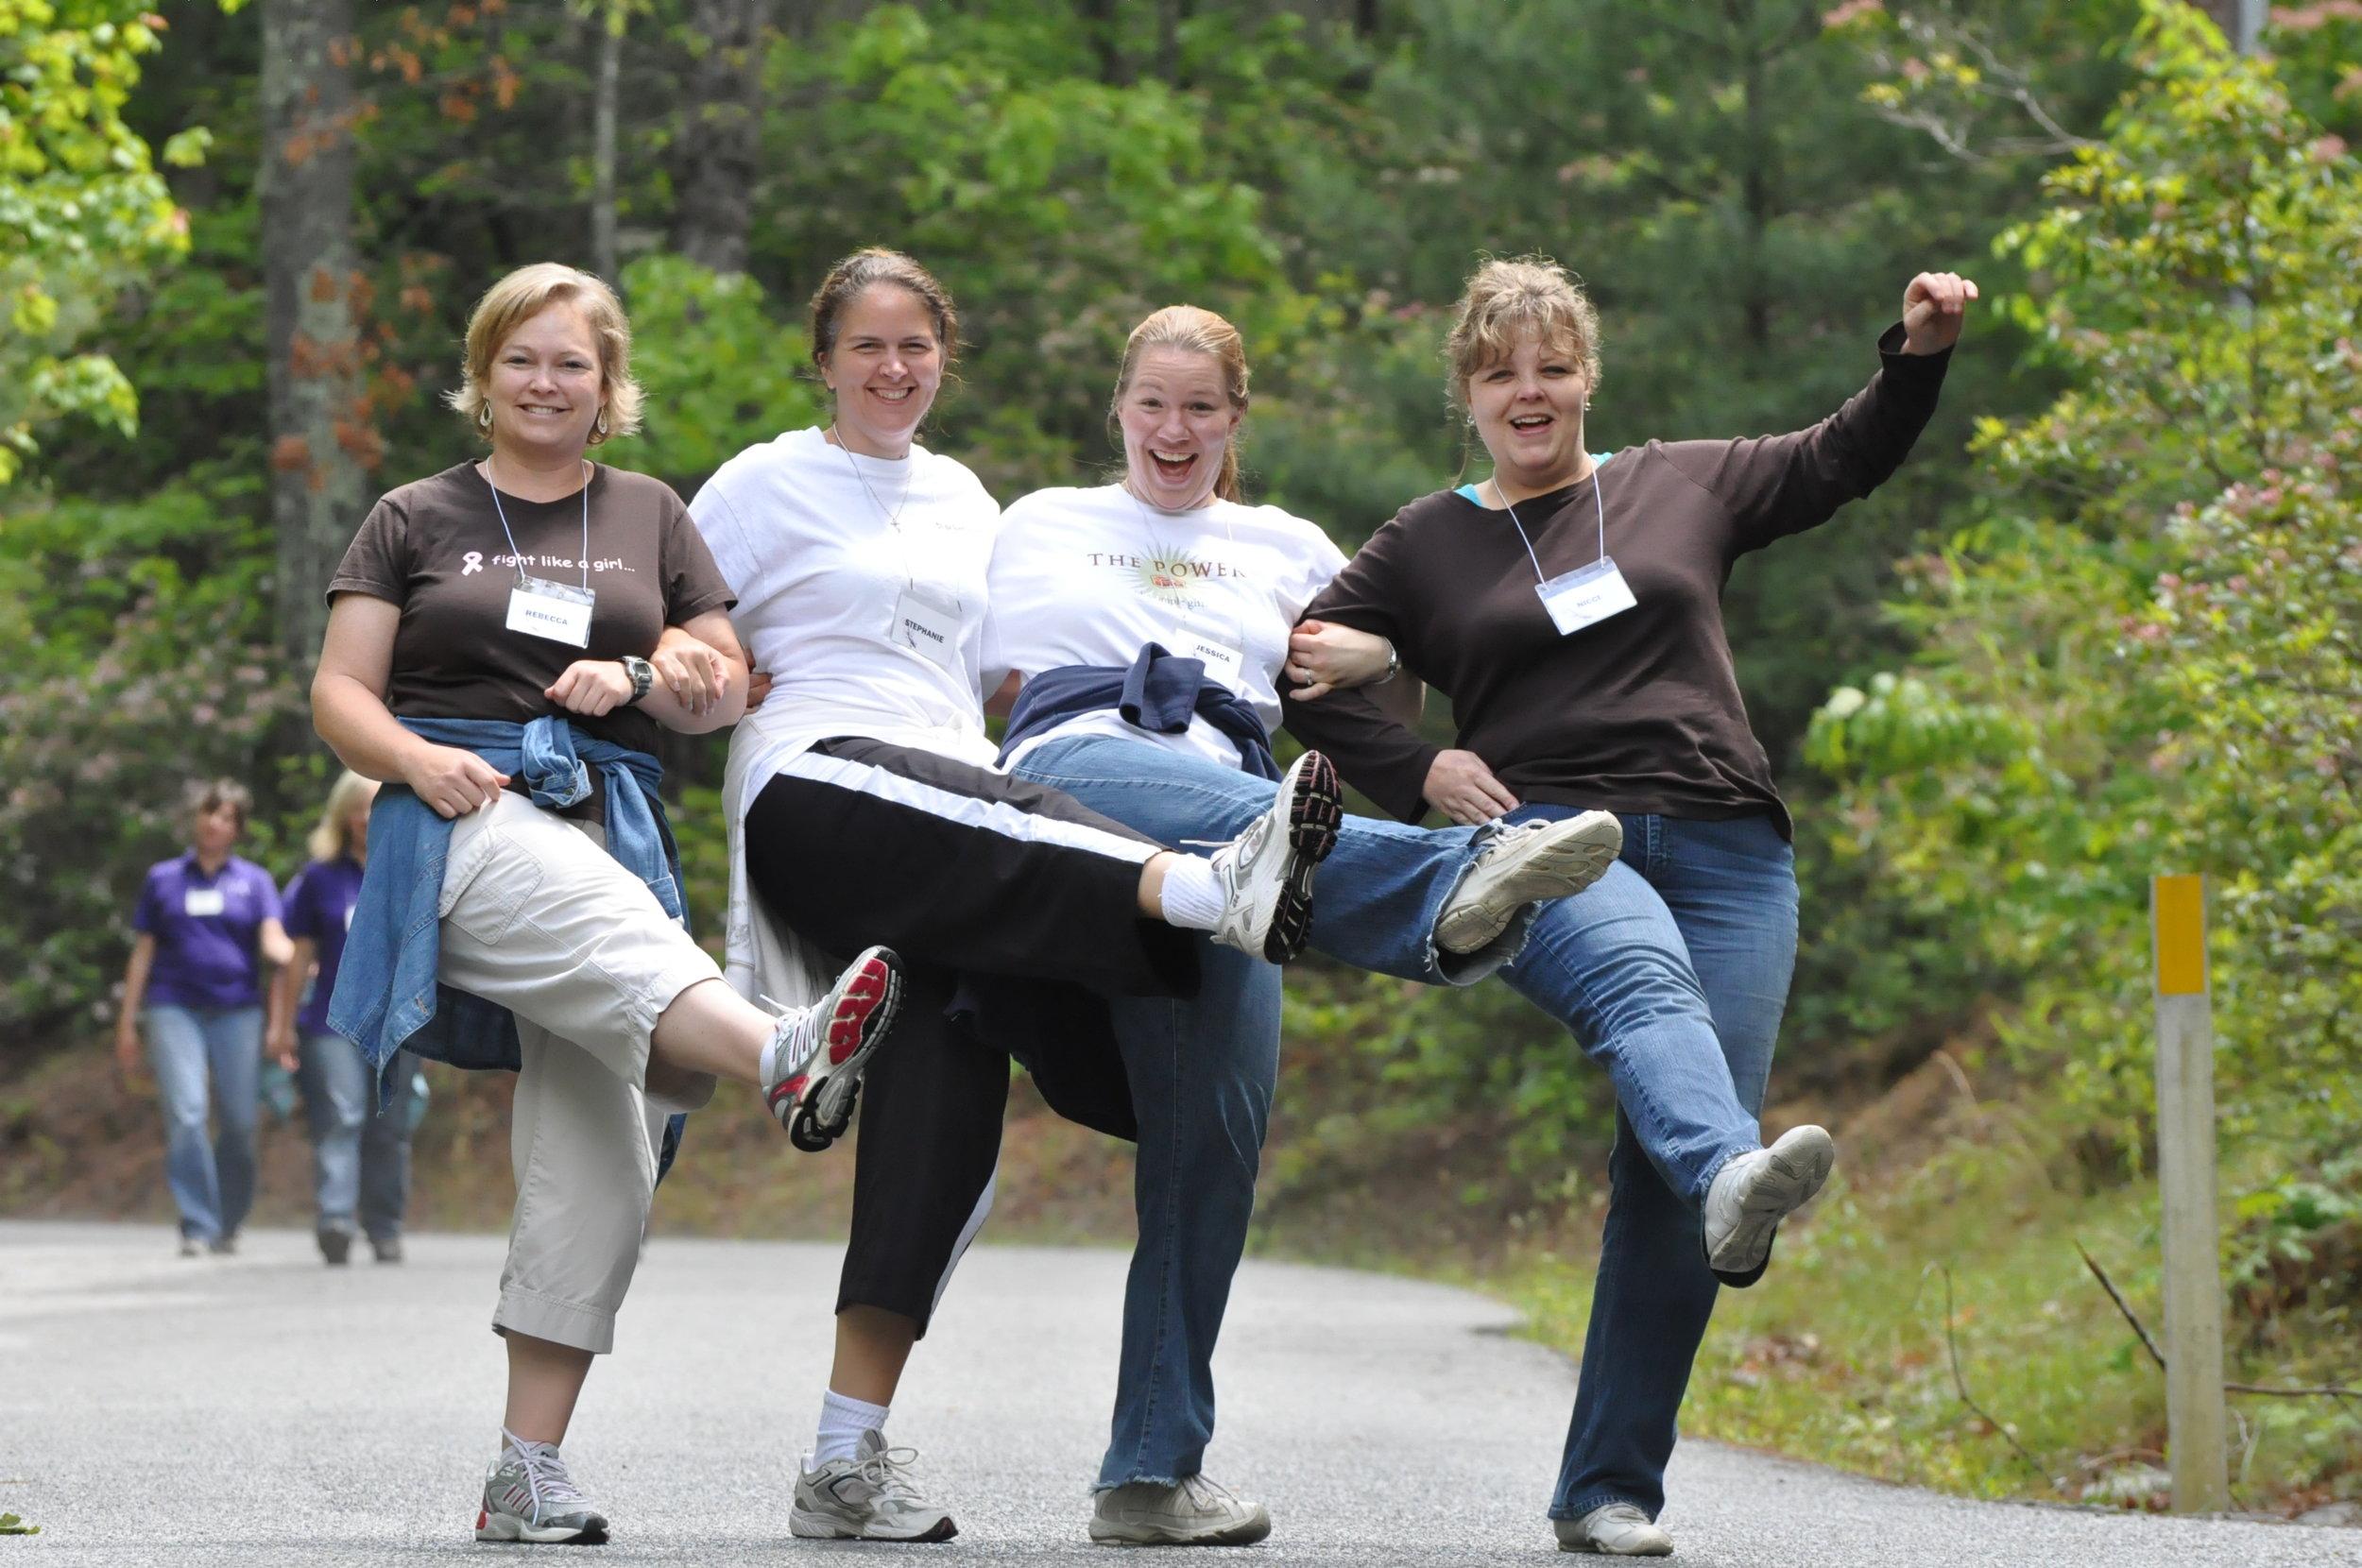 womens encounter may 2009 026.JPG